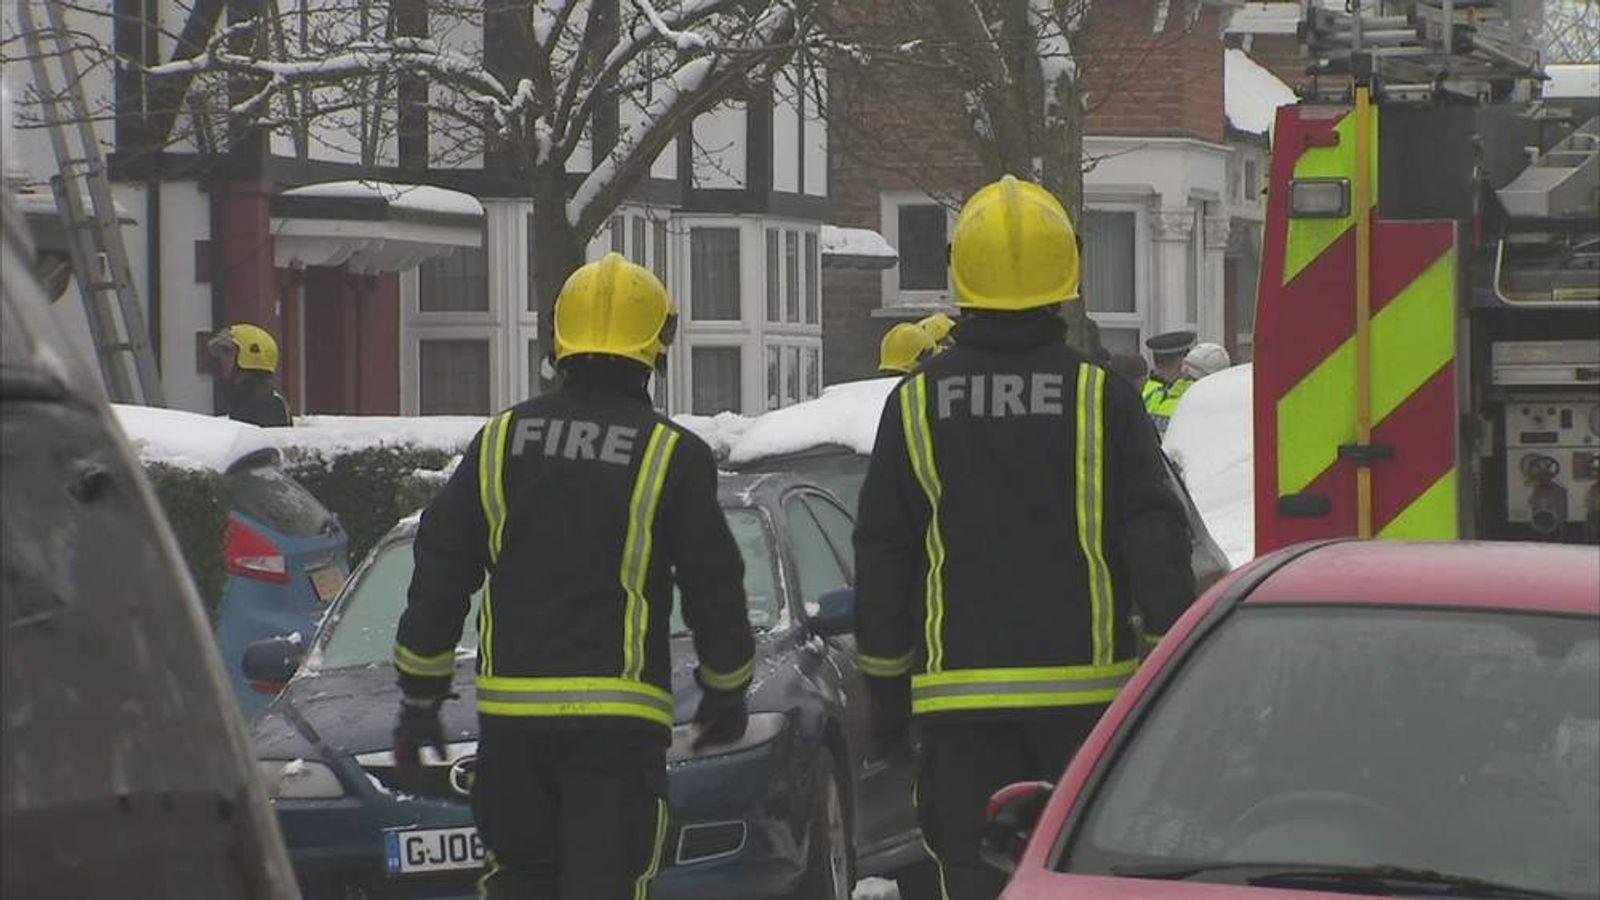 Finchley Fire